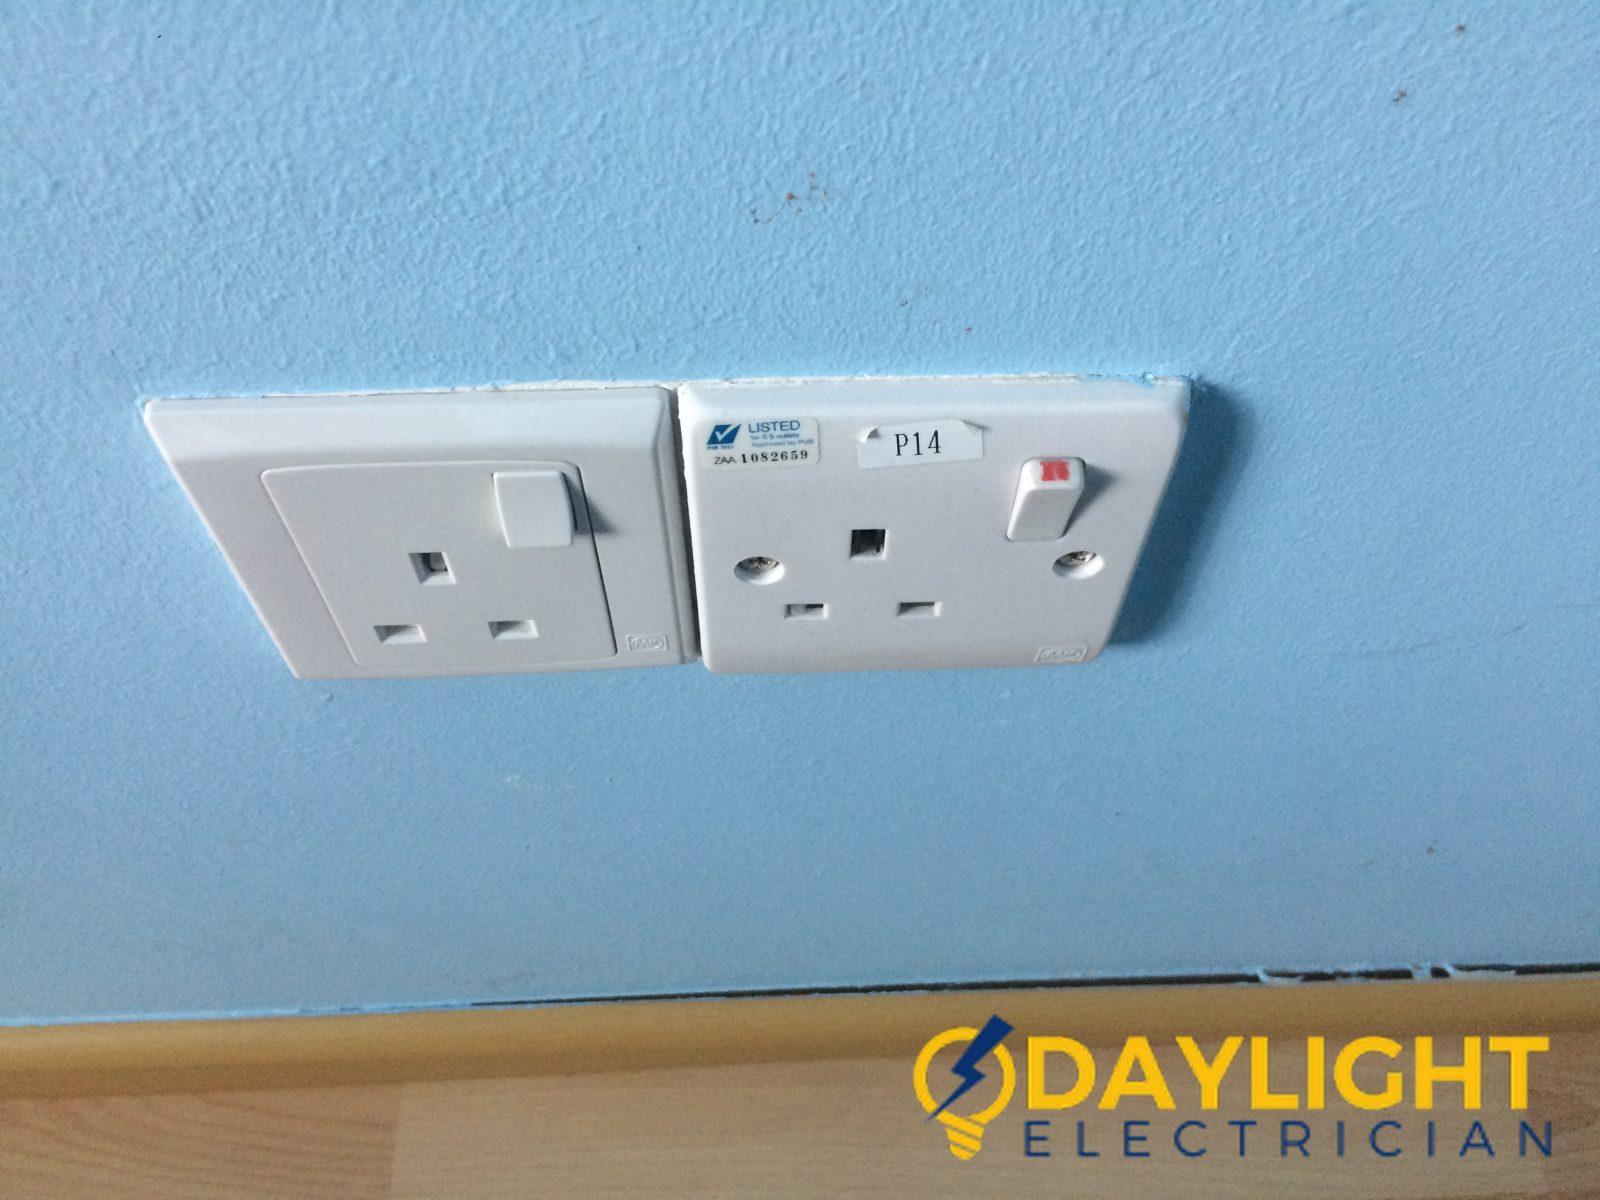 wall-socket-installation-daylight-electrician-singapore-condo-jurong-east-5_wm